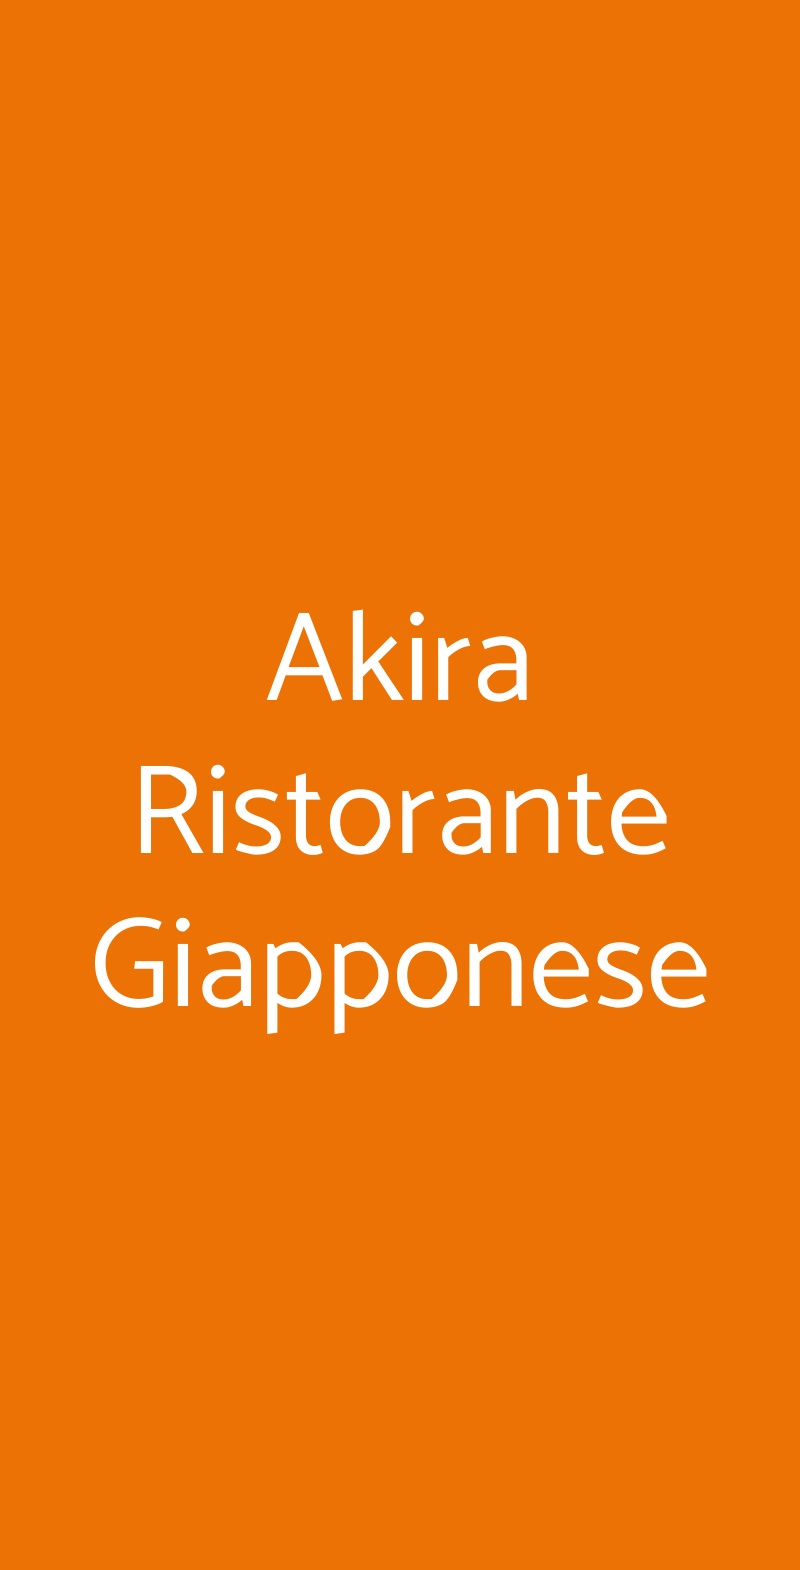 Akira Ristorante Giapponese Piacenza menù 1 pagina